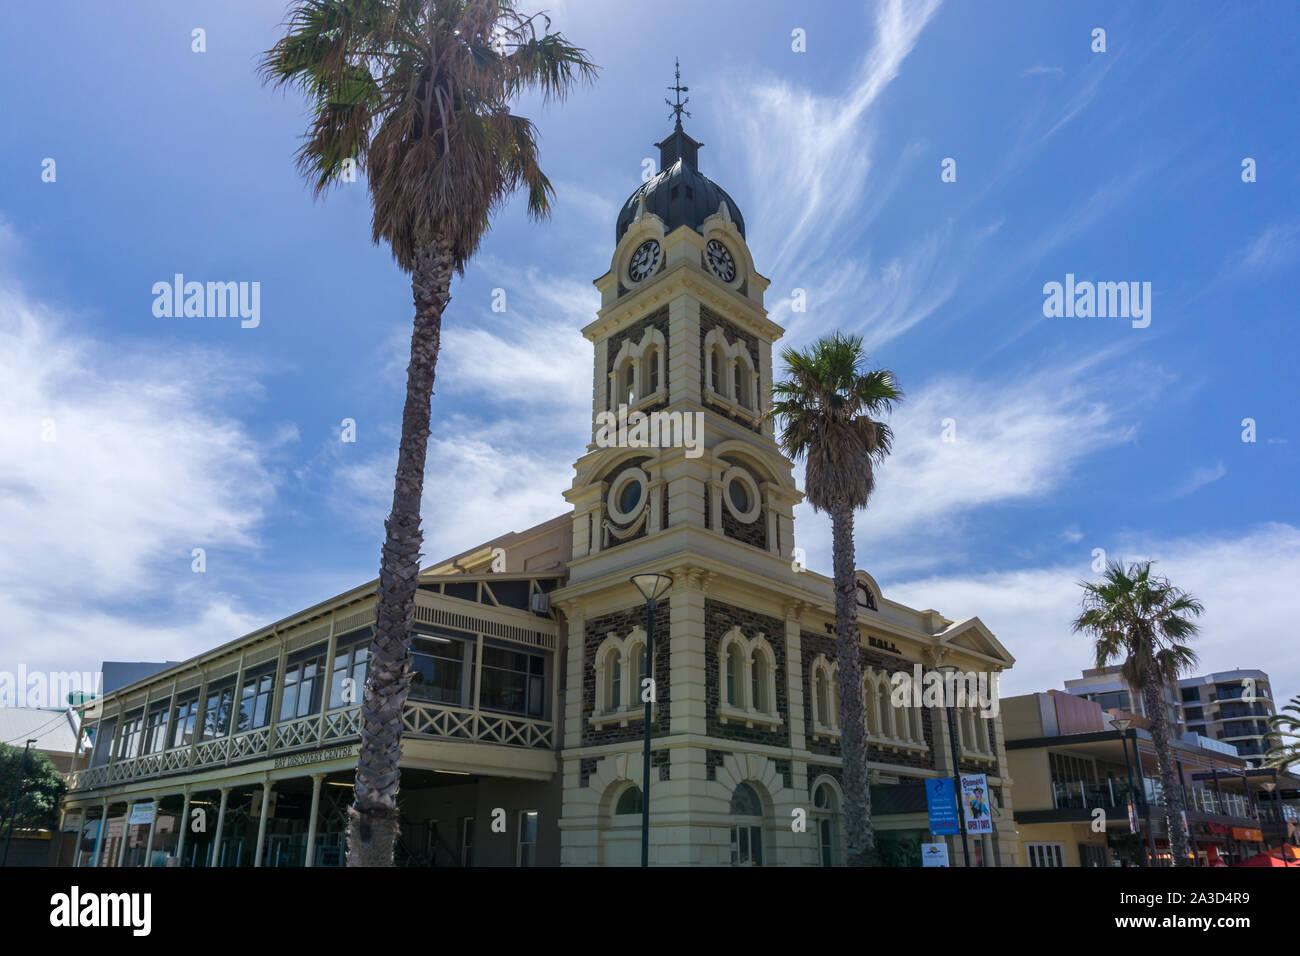 The Town hall of Glenelg, Australia Stock Photo